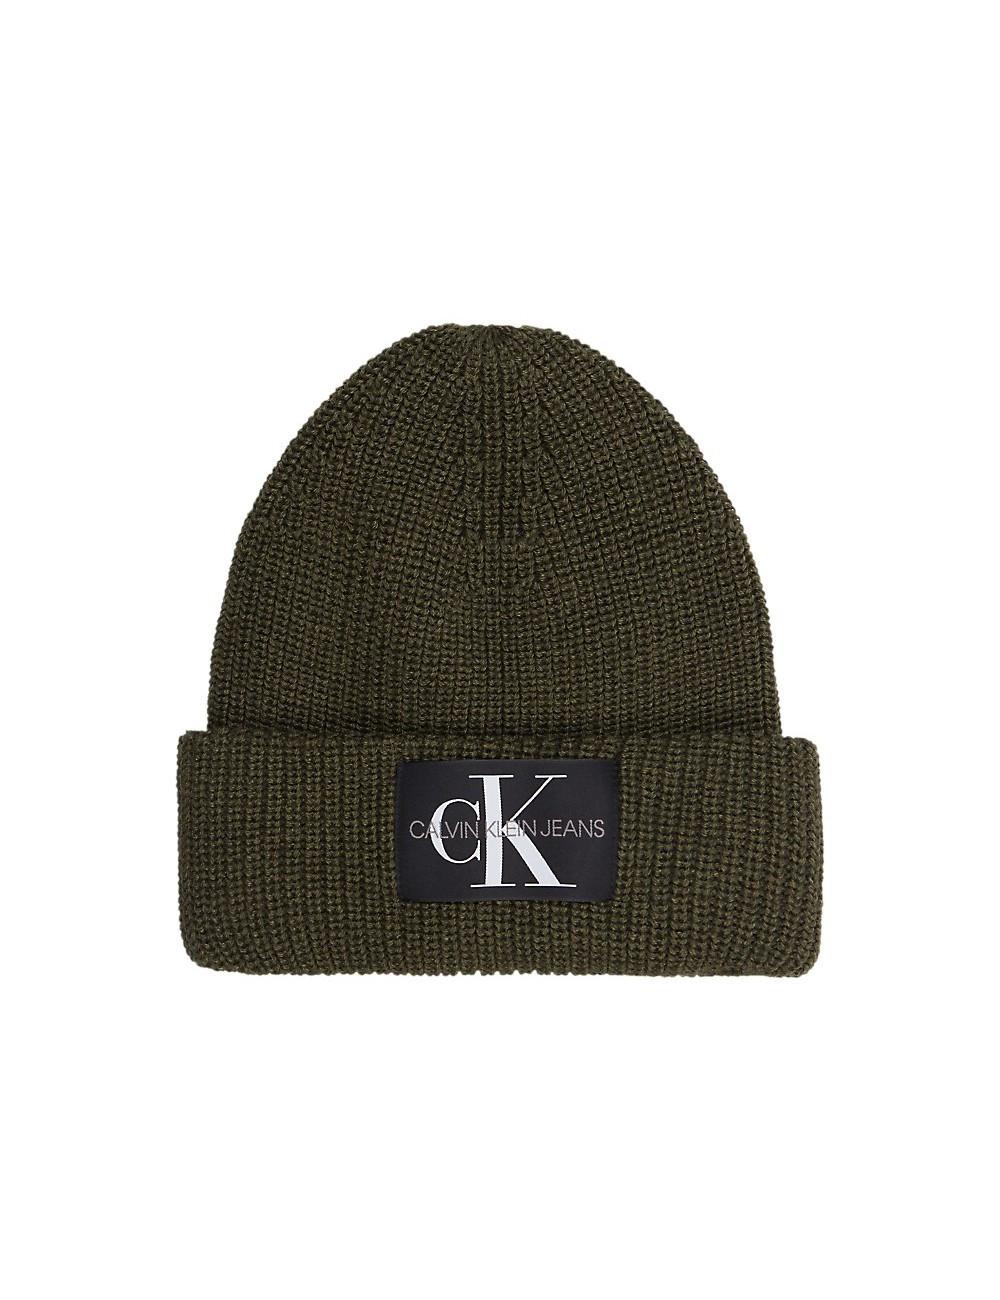 Calvin Klein Calvin Klein pánská olivová čepice